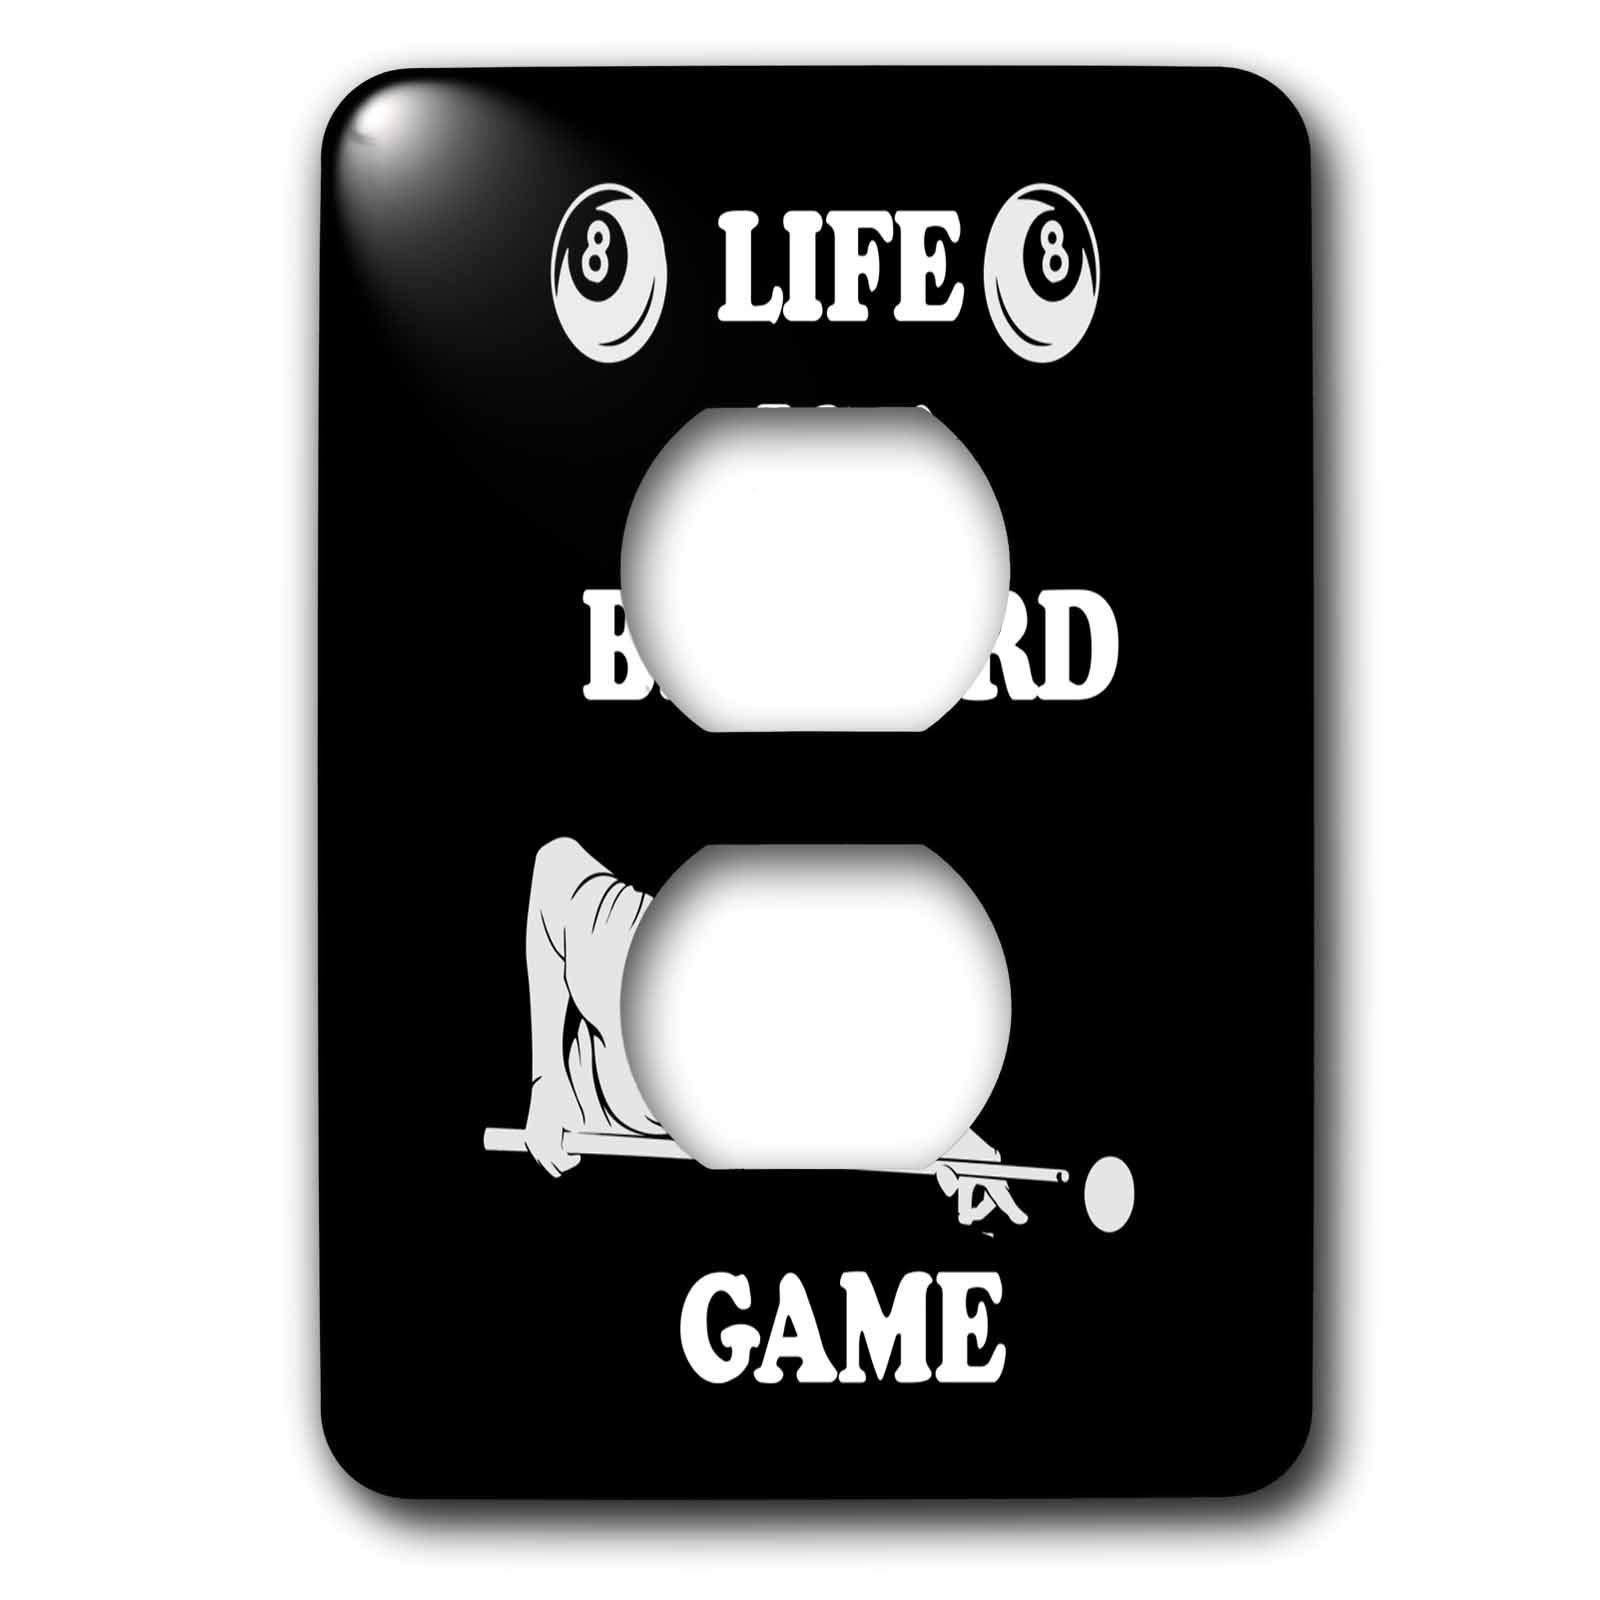 3dRose Sven Herkenrath Billiard - Billiard Snooker Design with Life is a Billiard Game - 2 plug outlet cover (lsp_296584_6)